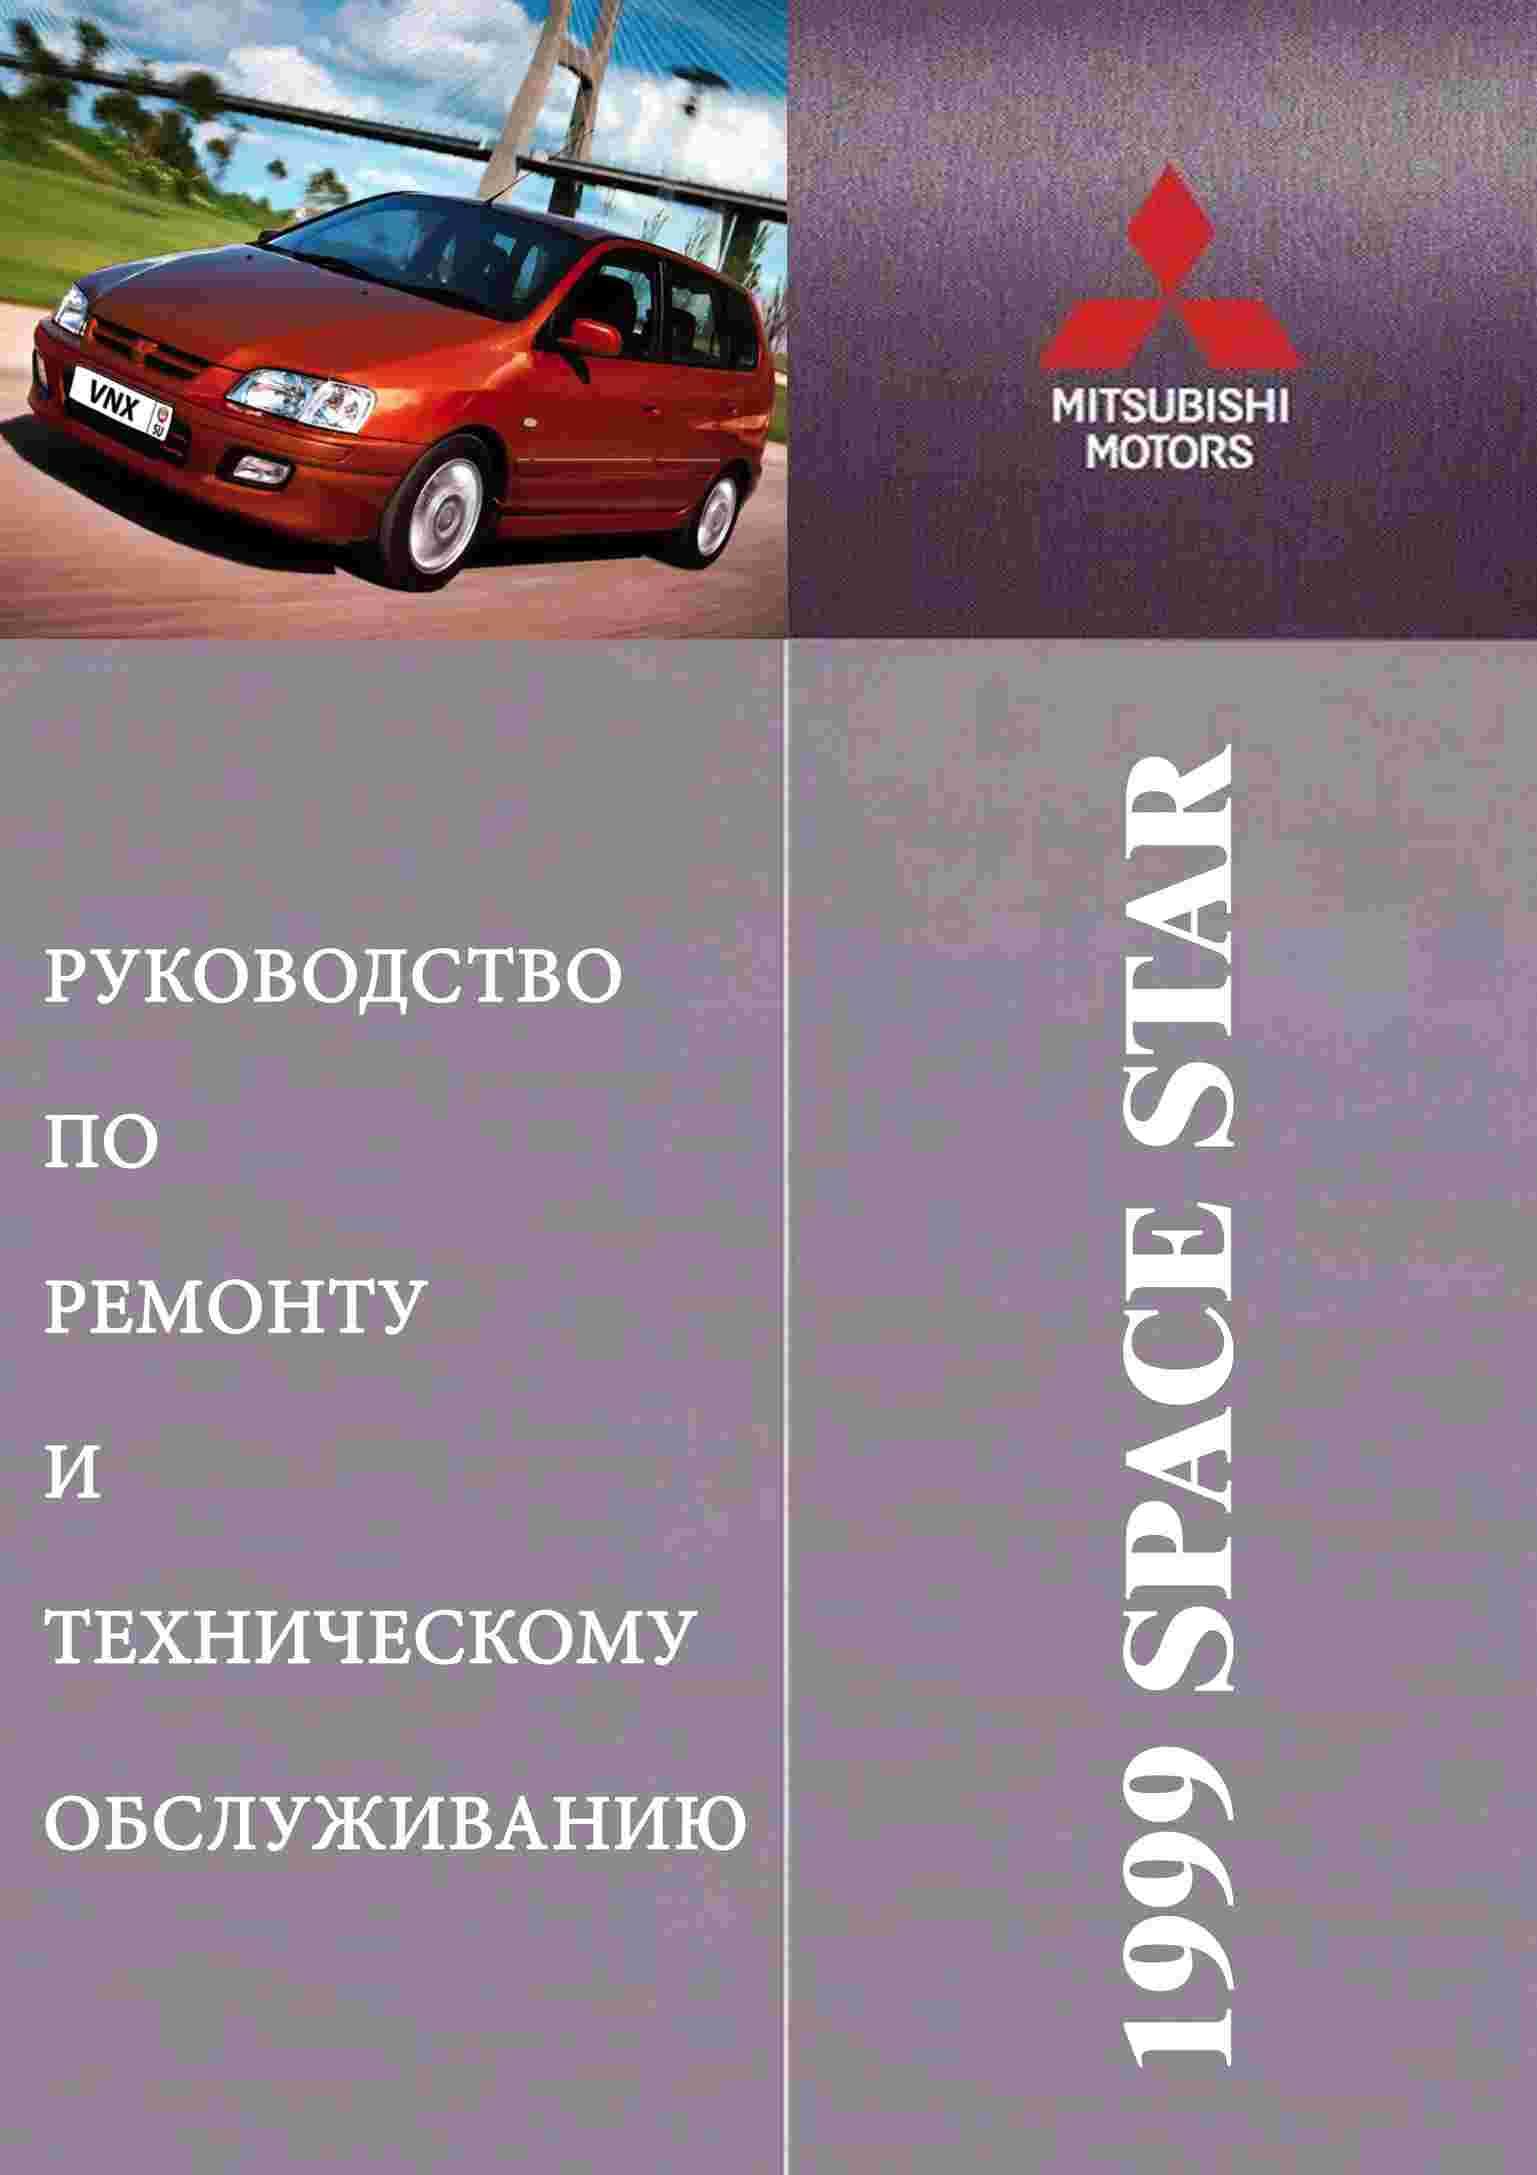 Mitsubishi Space Star 1999-2004 Руководство по ремонту и эксплуатации обложка